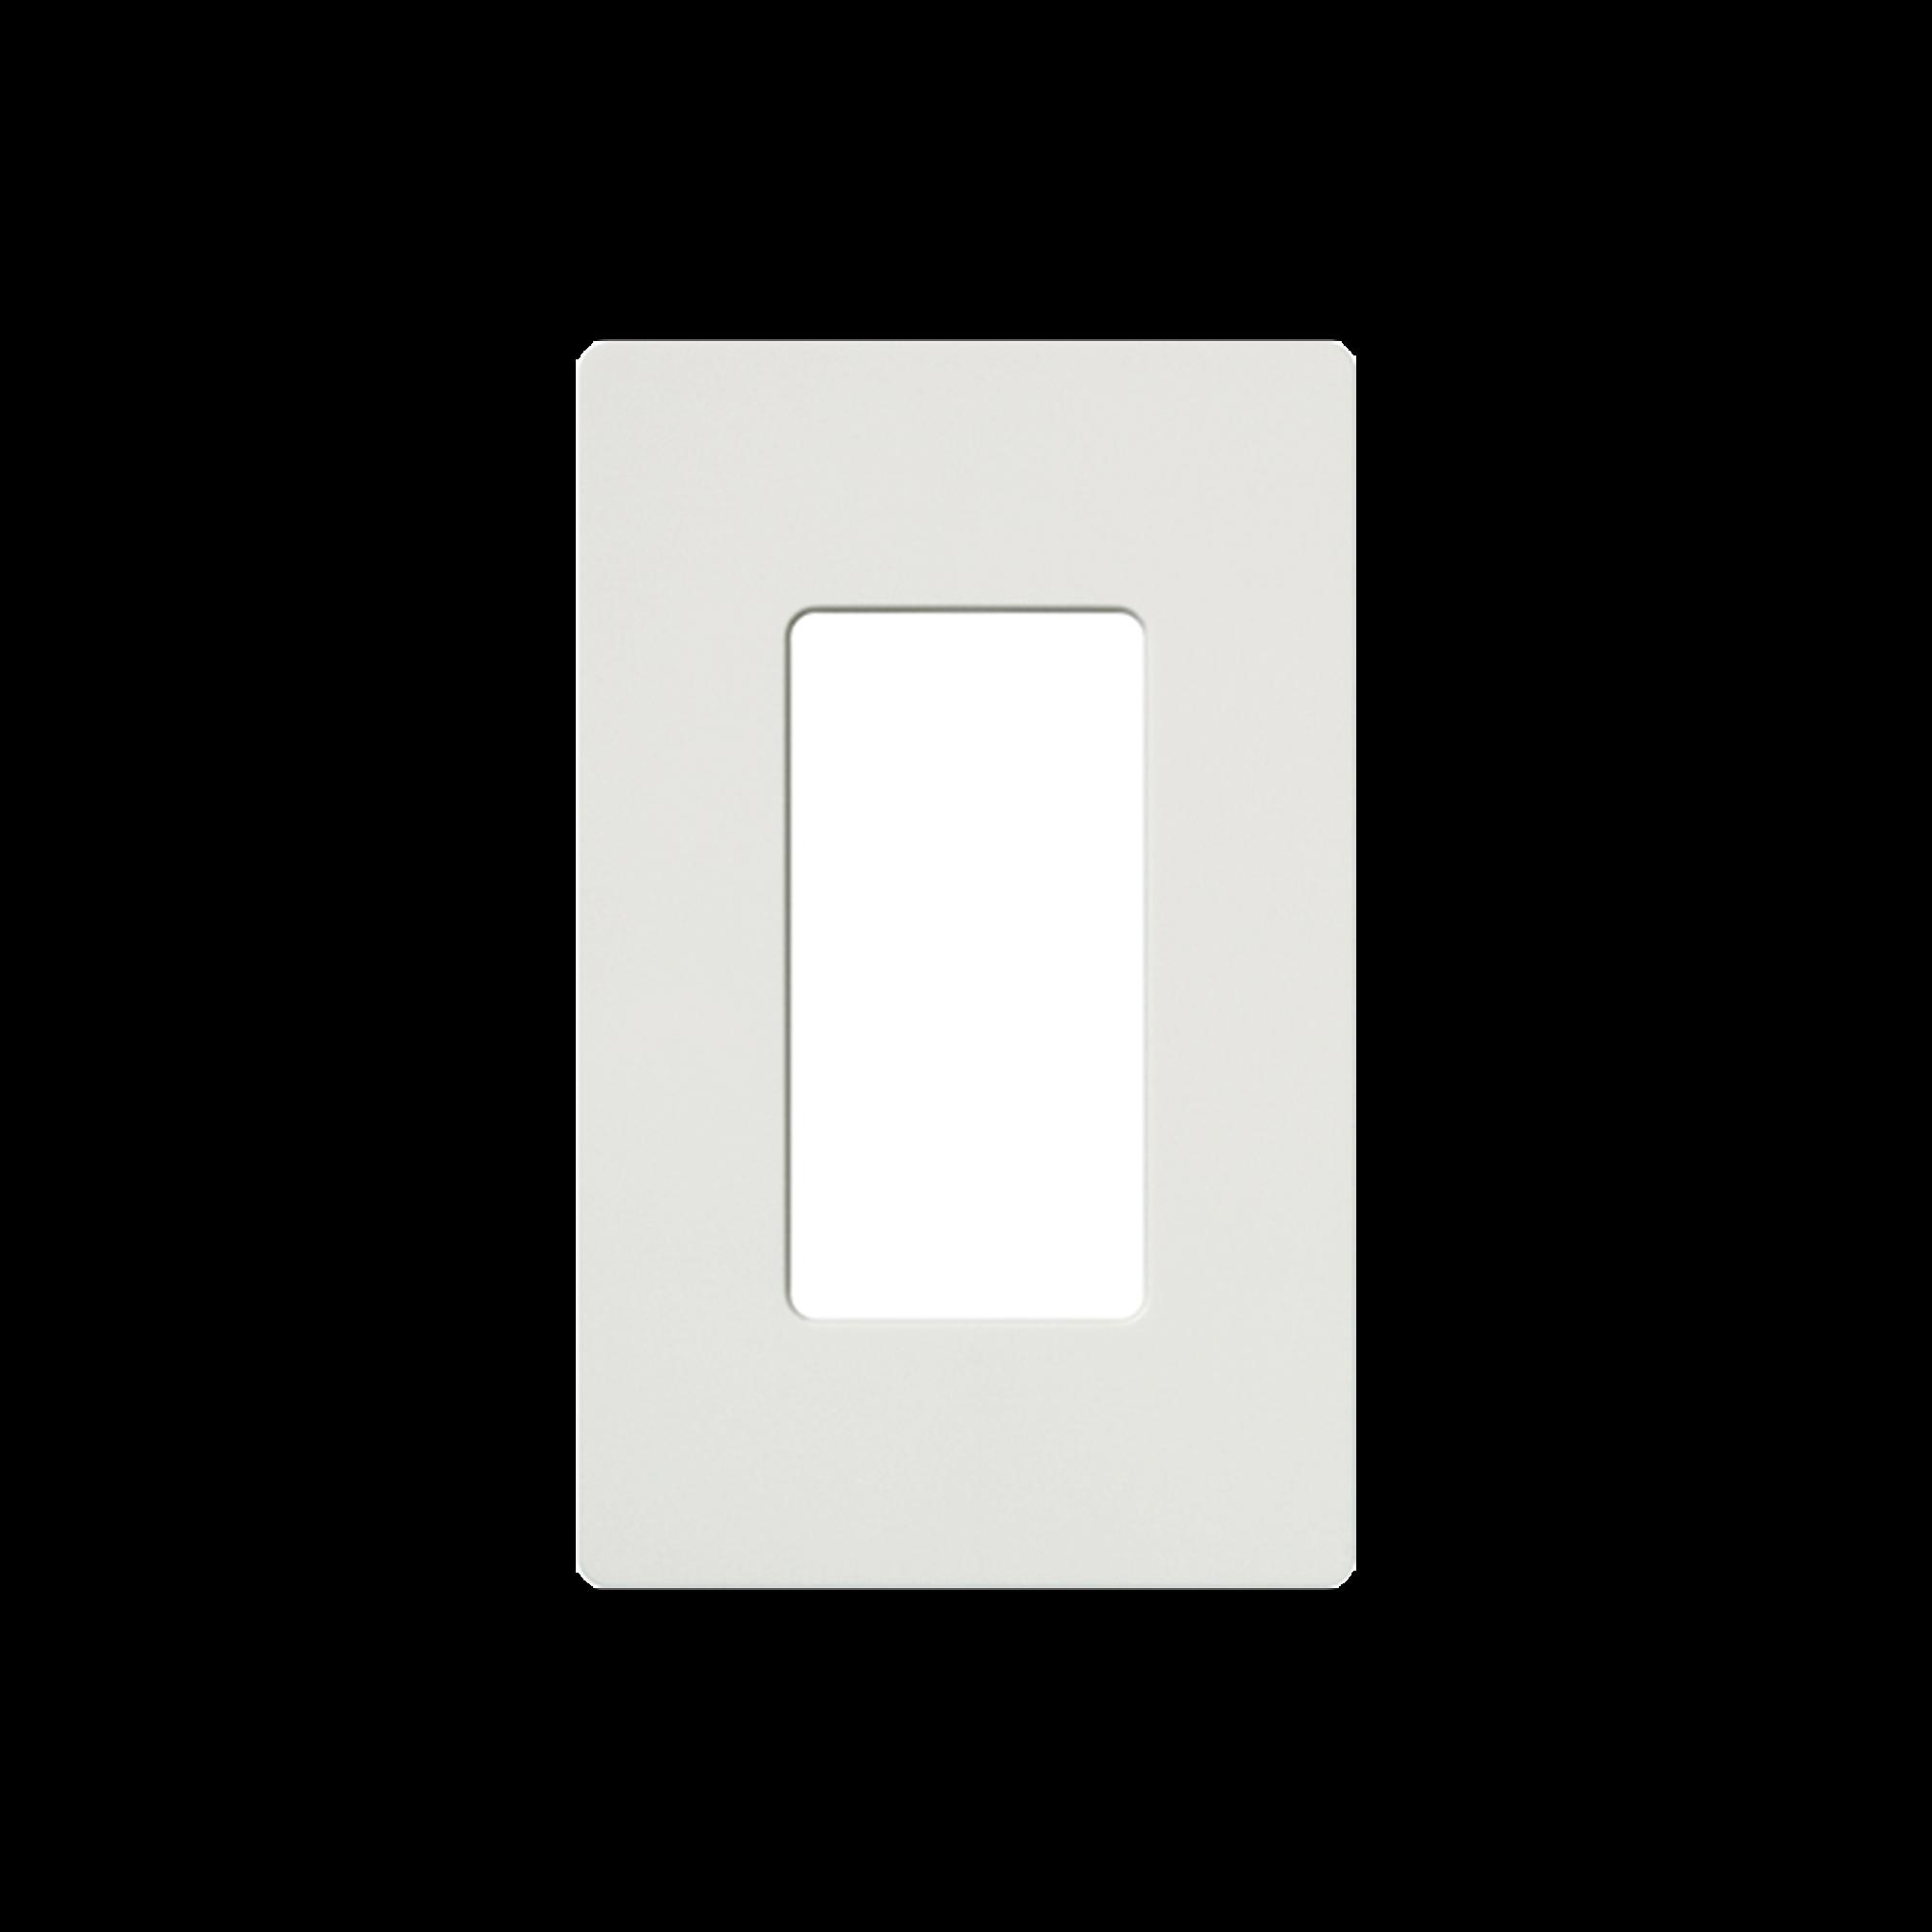 Placa de pared 1 espacio, para atenuador (dimmer), apagador ó control remoto inalámbrico LUTRON.